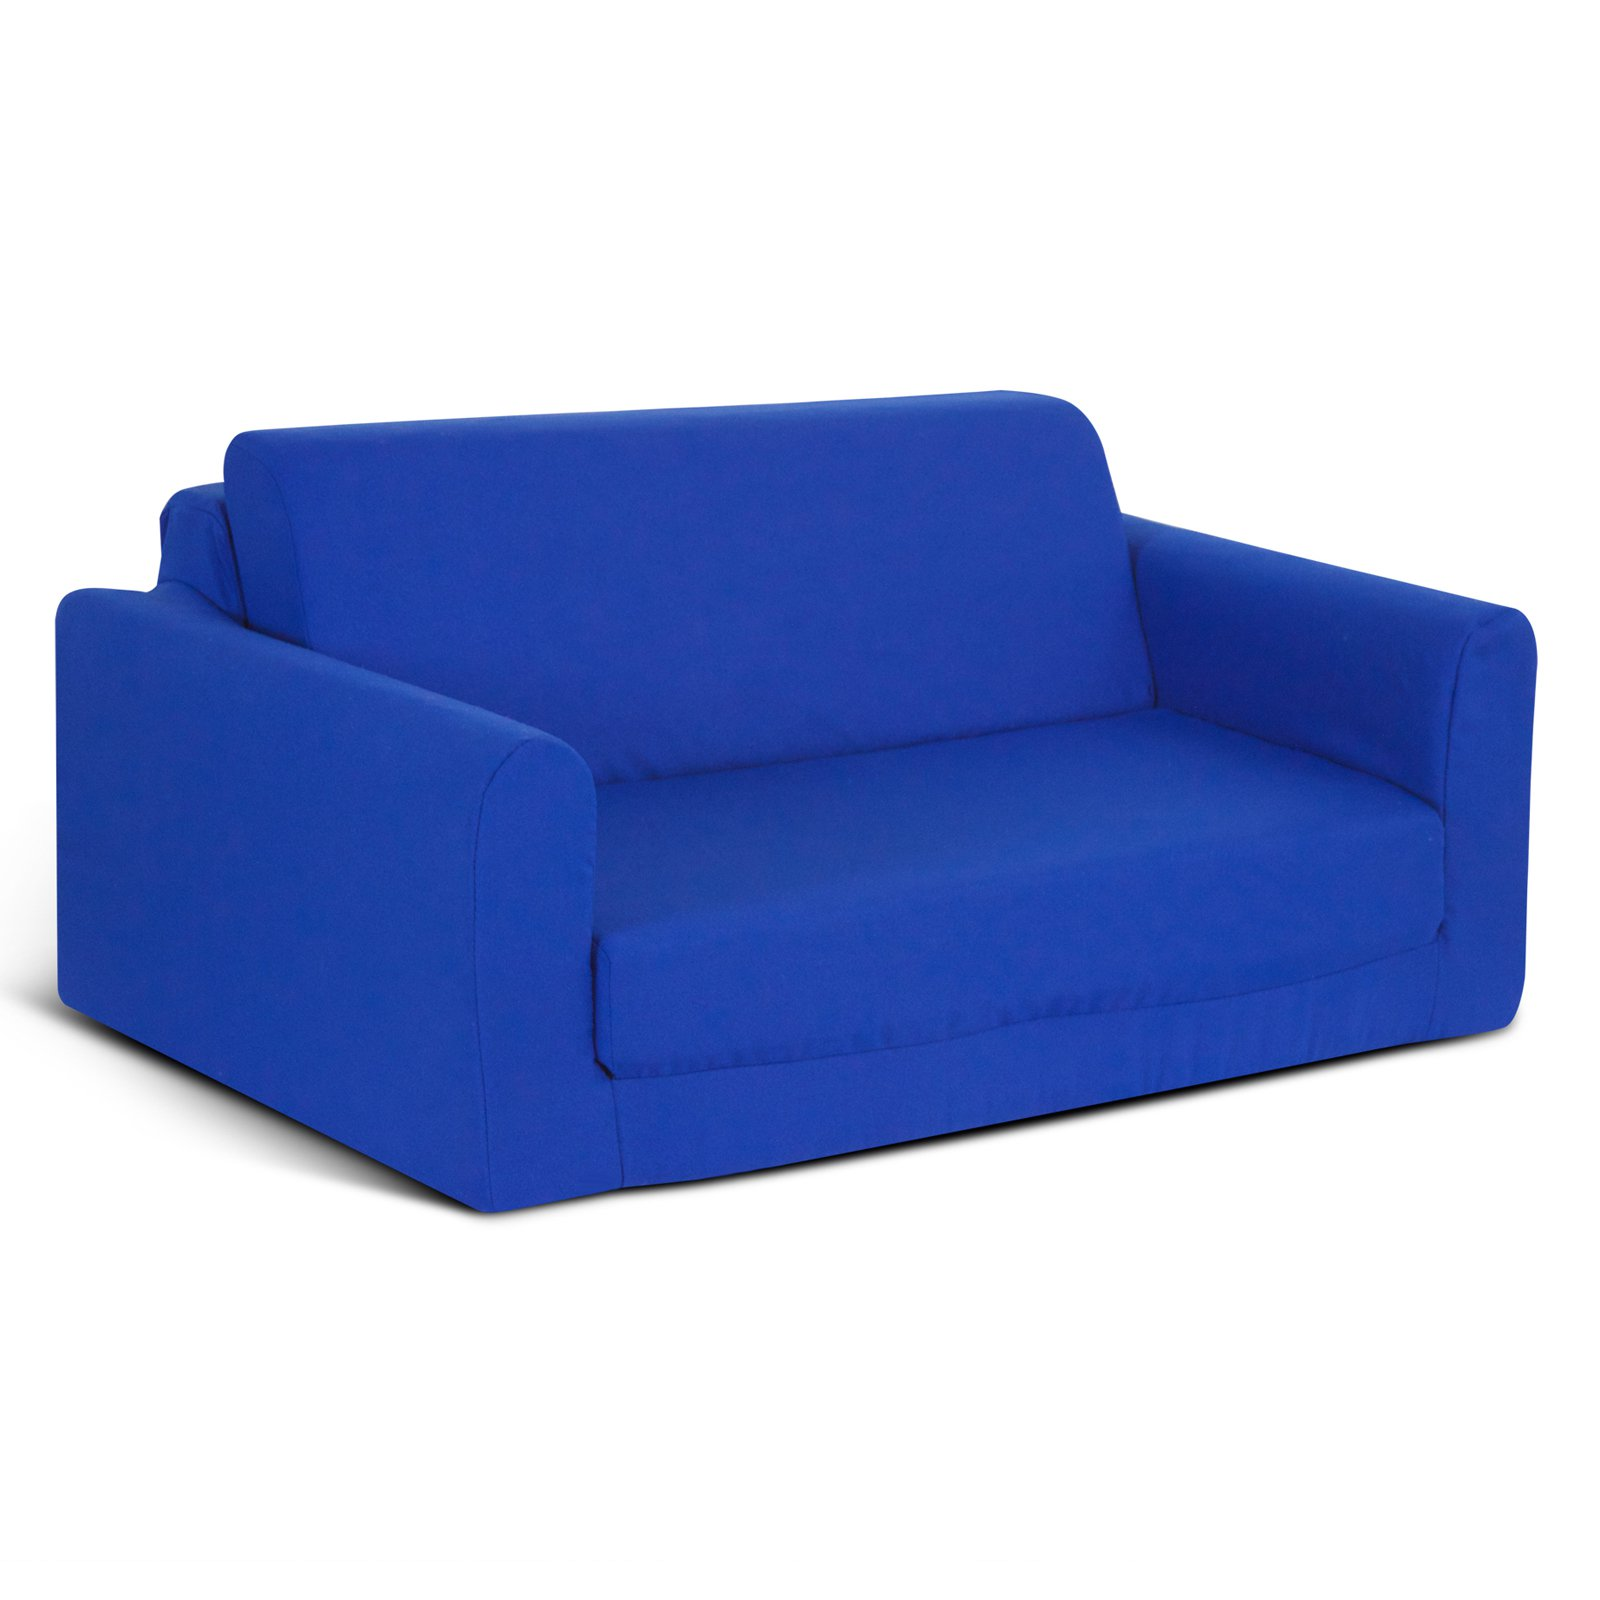 used sleeper sofa for sale rattan corner outdoor furniture black floor tiles